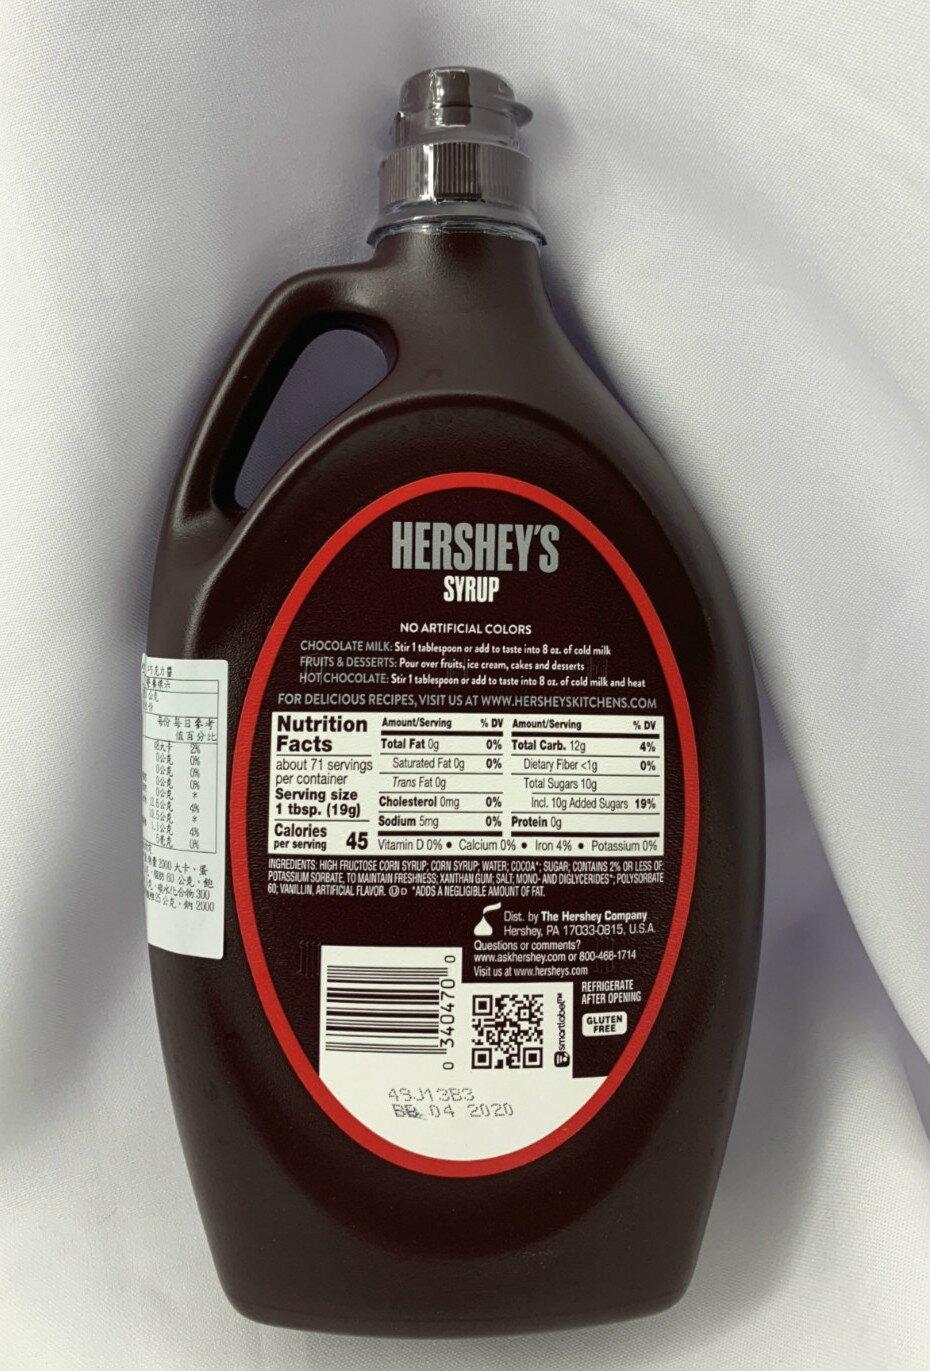 HERSHEY'S 巧克力醬 1.36kg 抹醬 果醬 巧克力 好市多 2